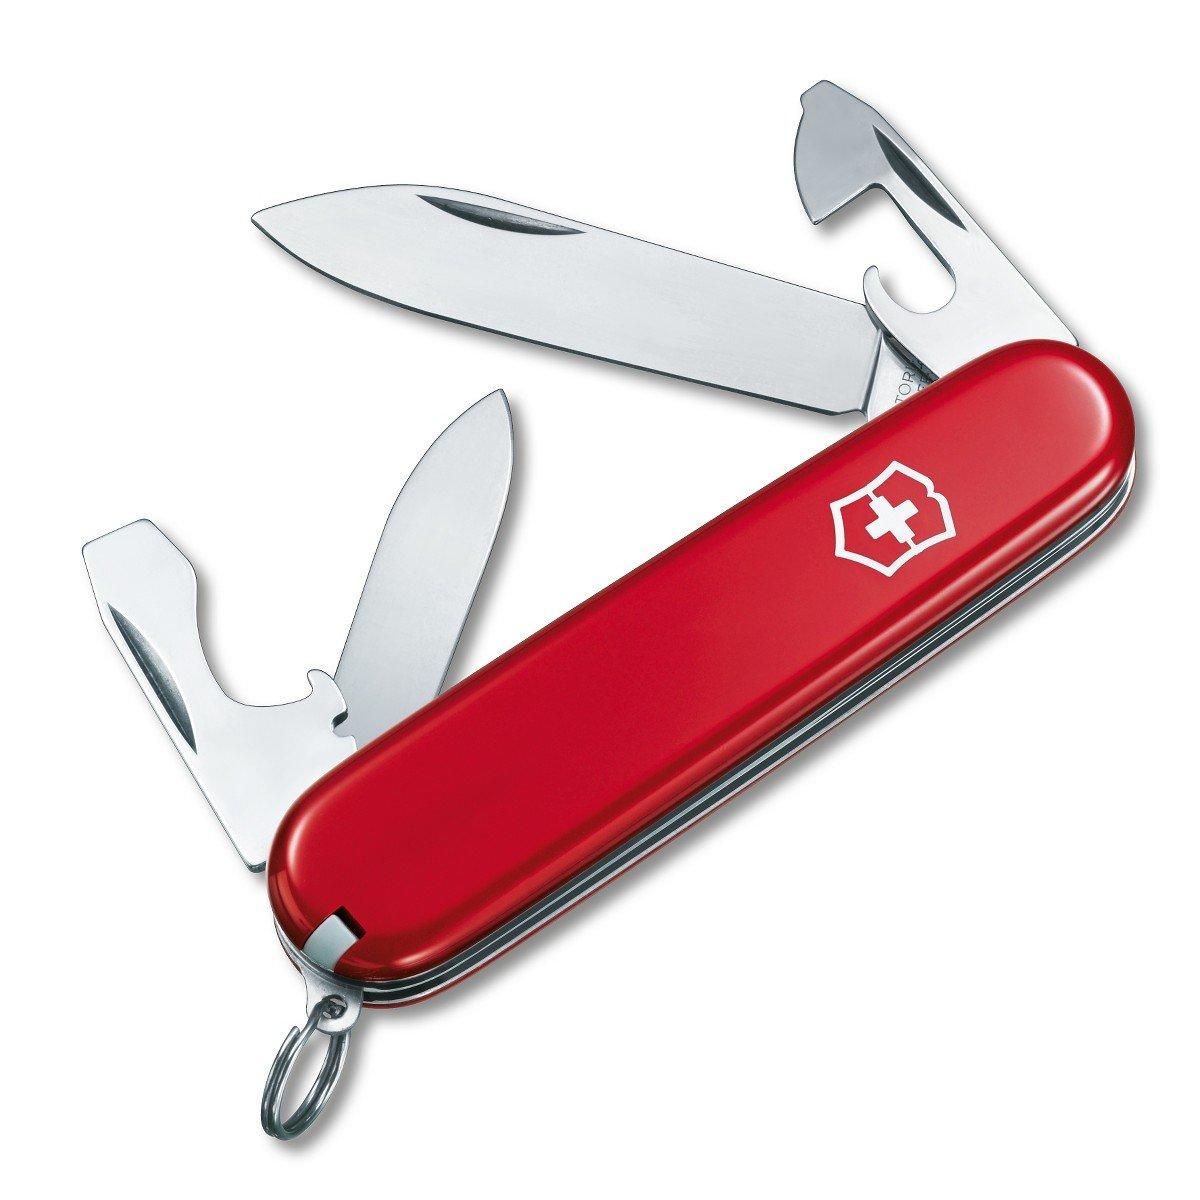 Amazon.com: Victorinox Recruit Swiss Army Knife: Victorinox ...